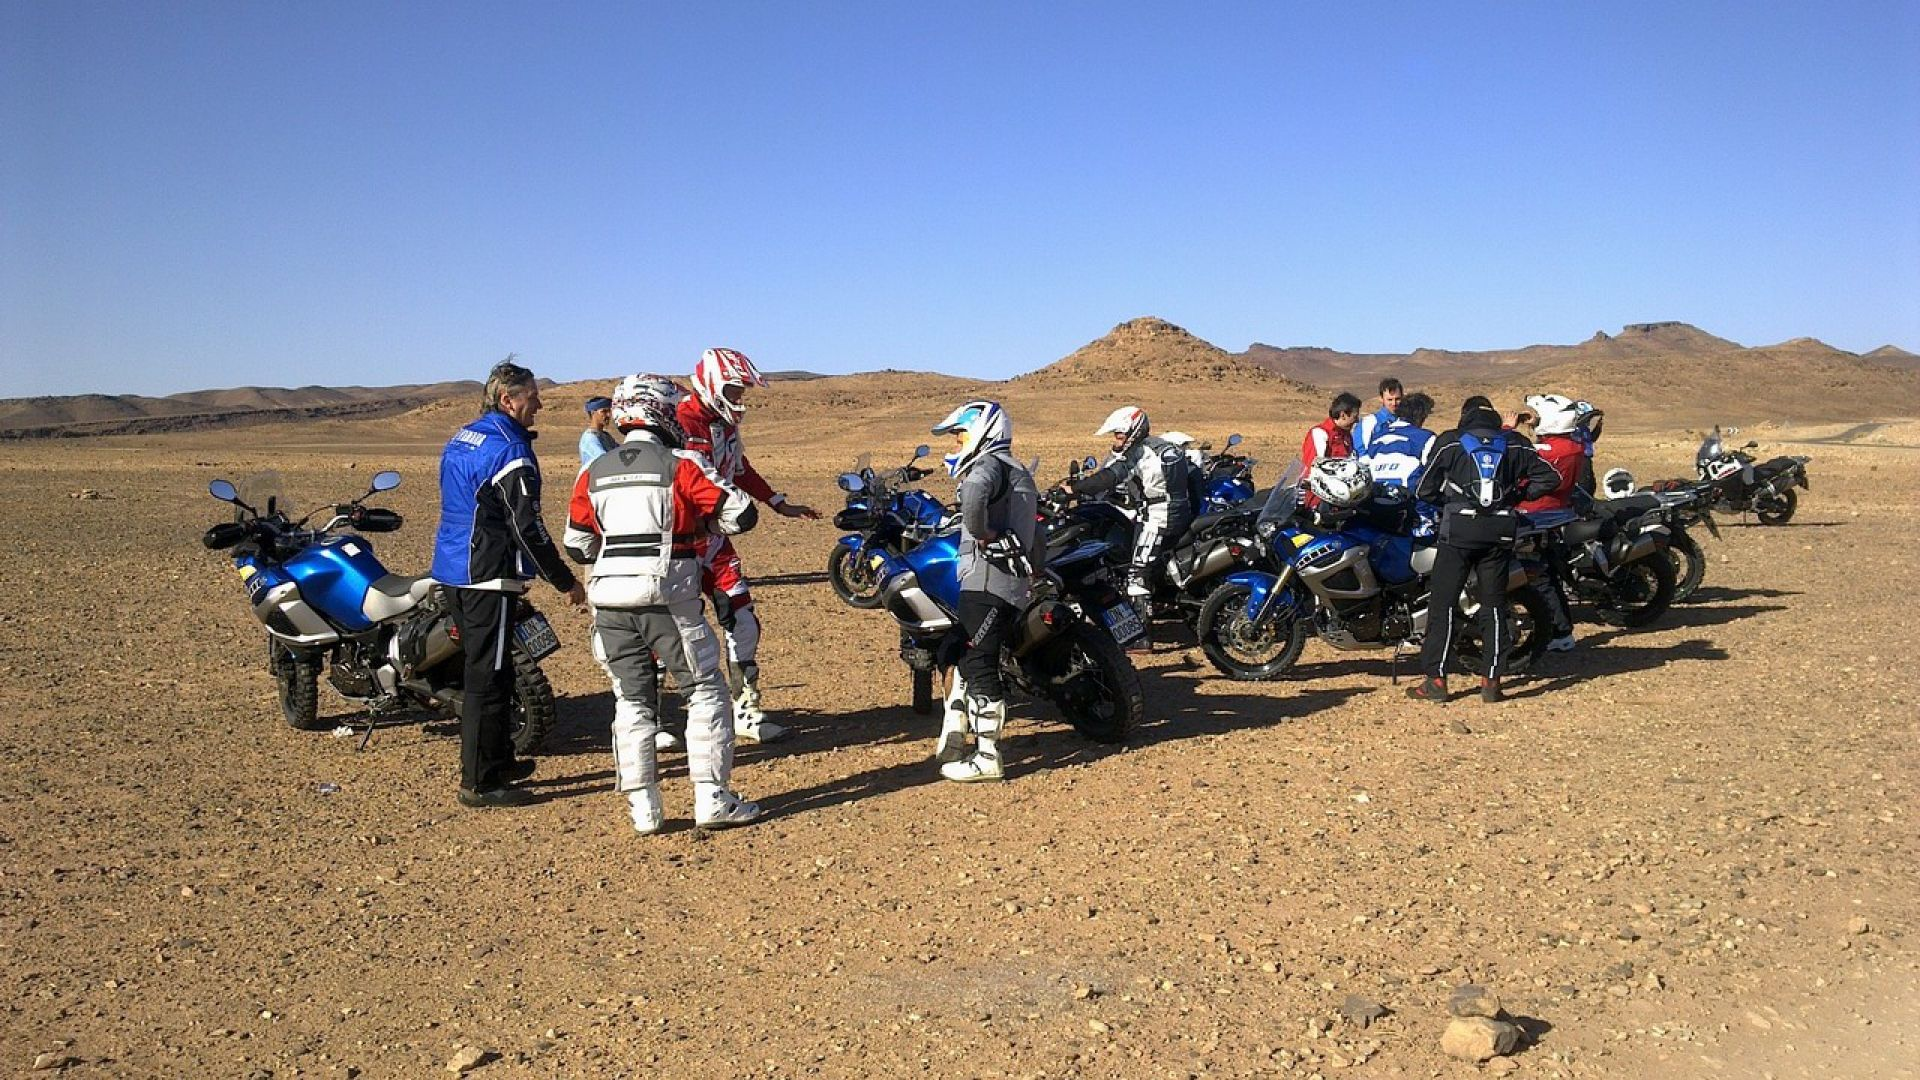 Immagine 170: In Marocco con la Yamaha Super Ténéré